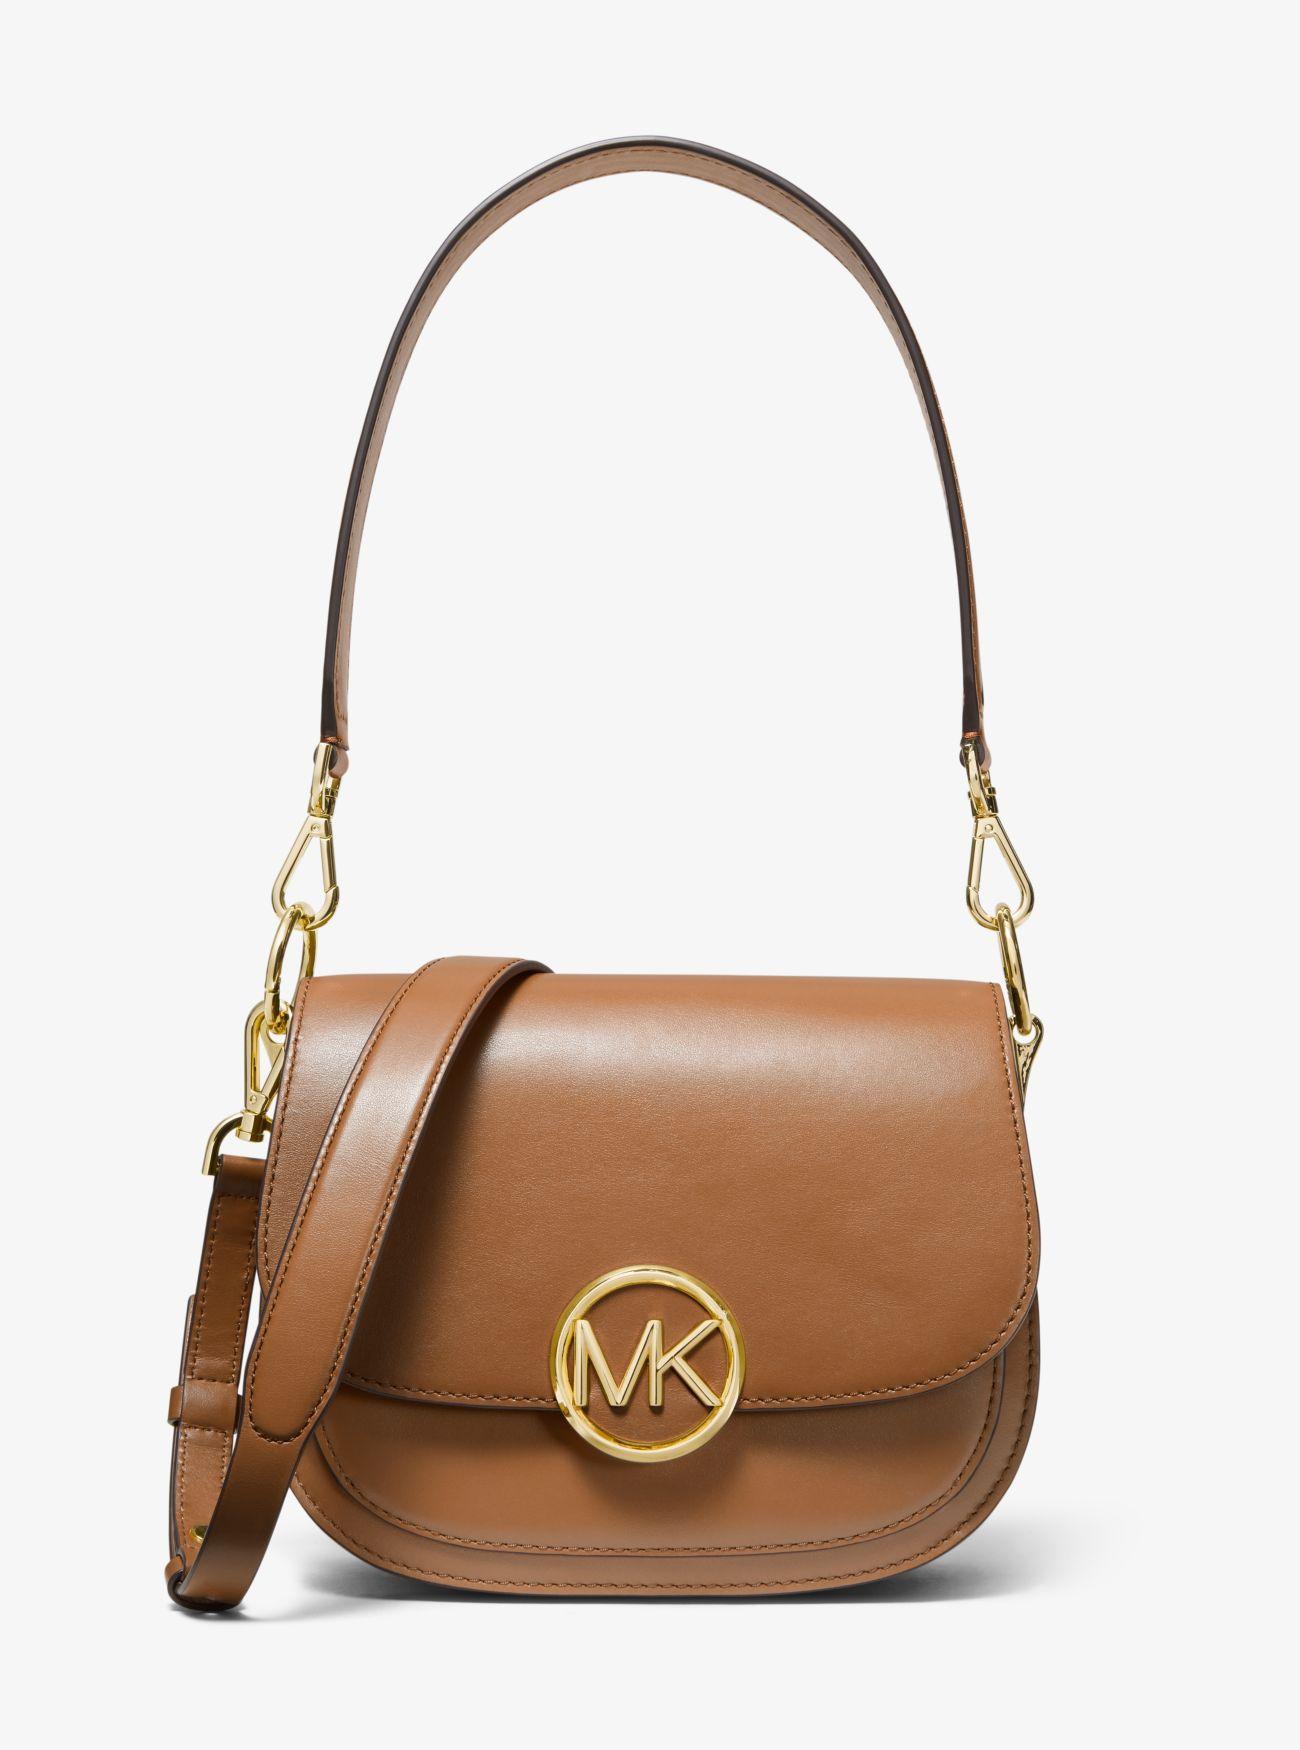 8bc520f3310899 Michael Kors Lillie Medium Leather Saddle Bag in Brown - Lyst